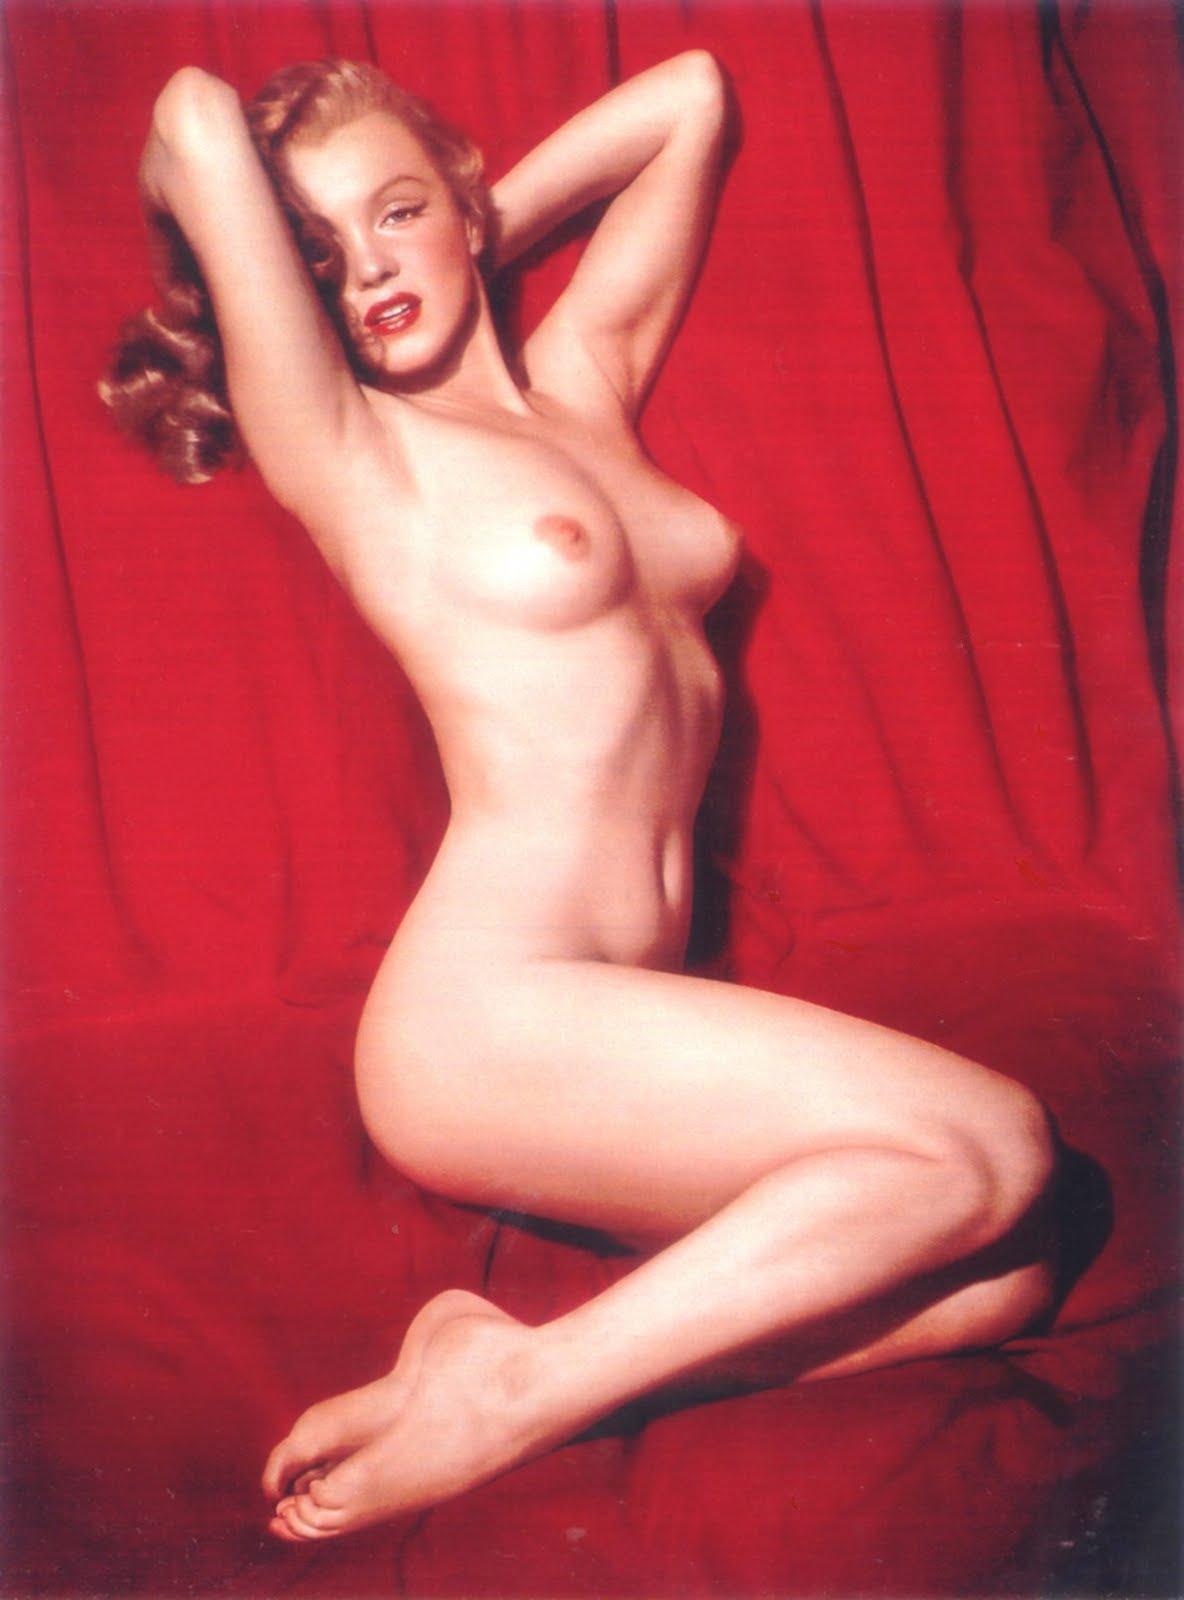 Avalone Porno marilyn monroe porn star - other - hot photos